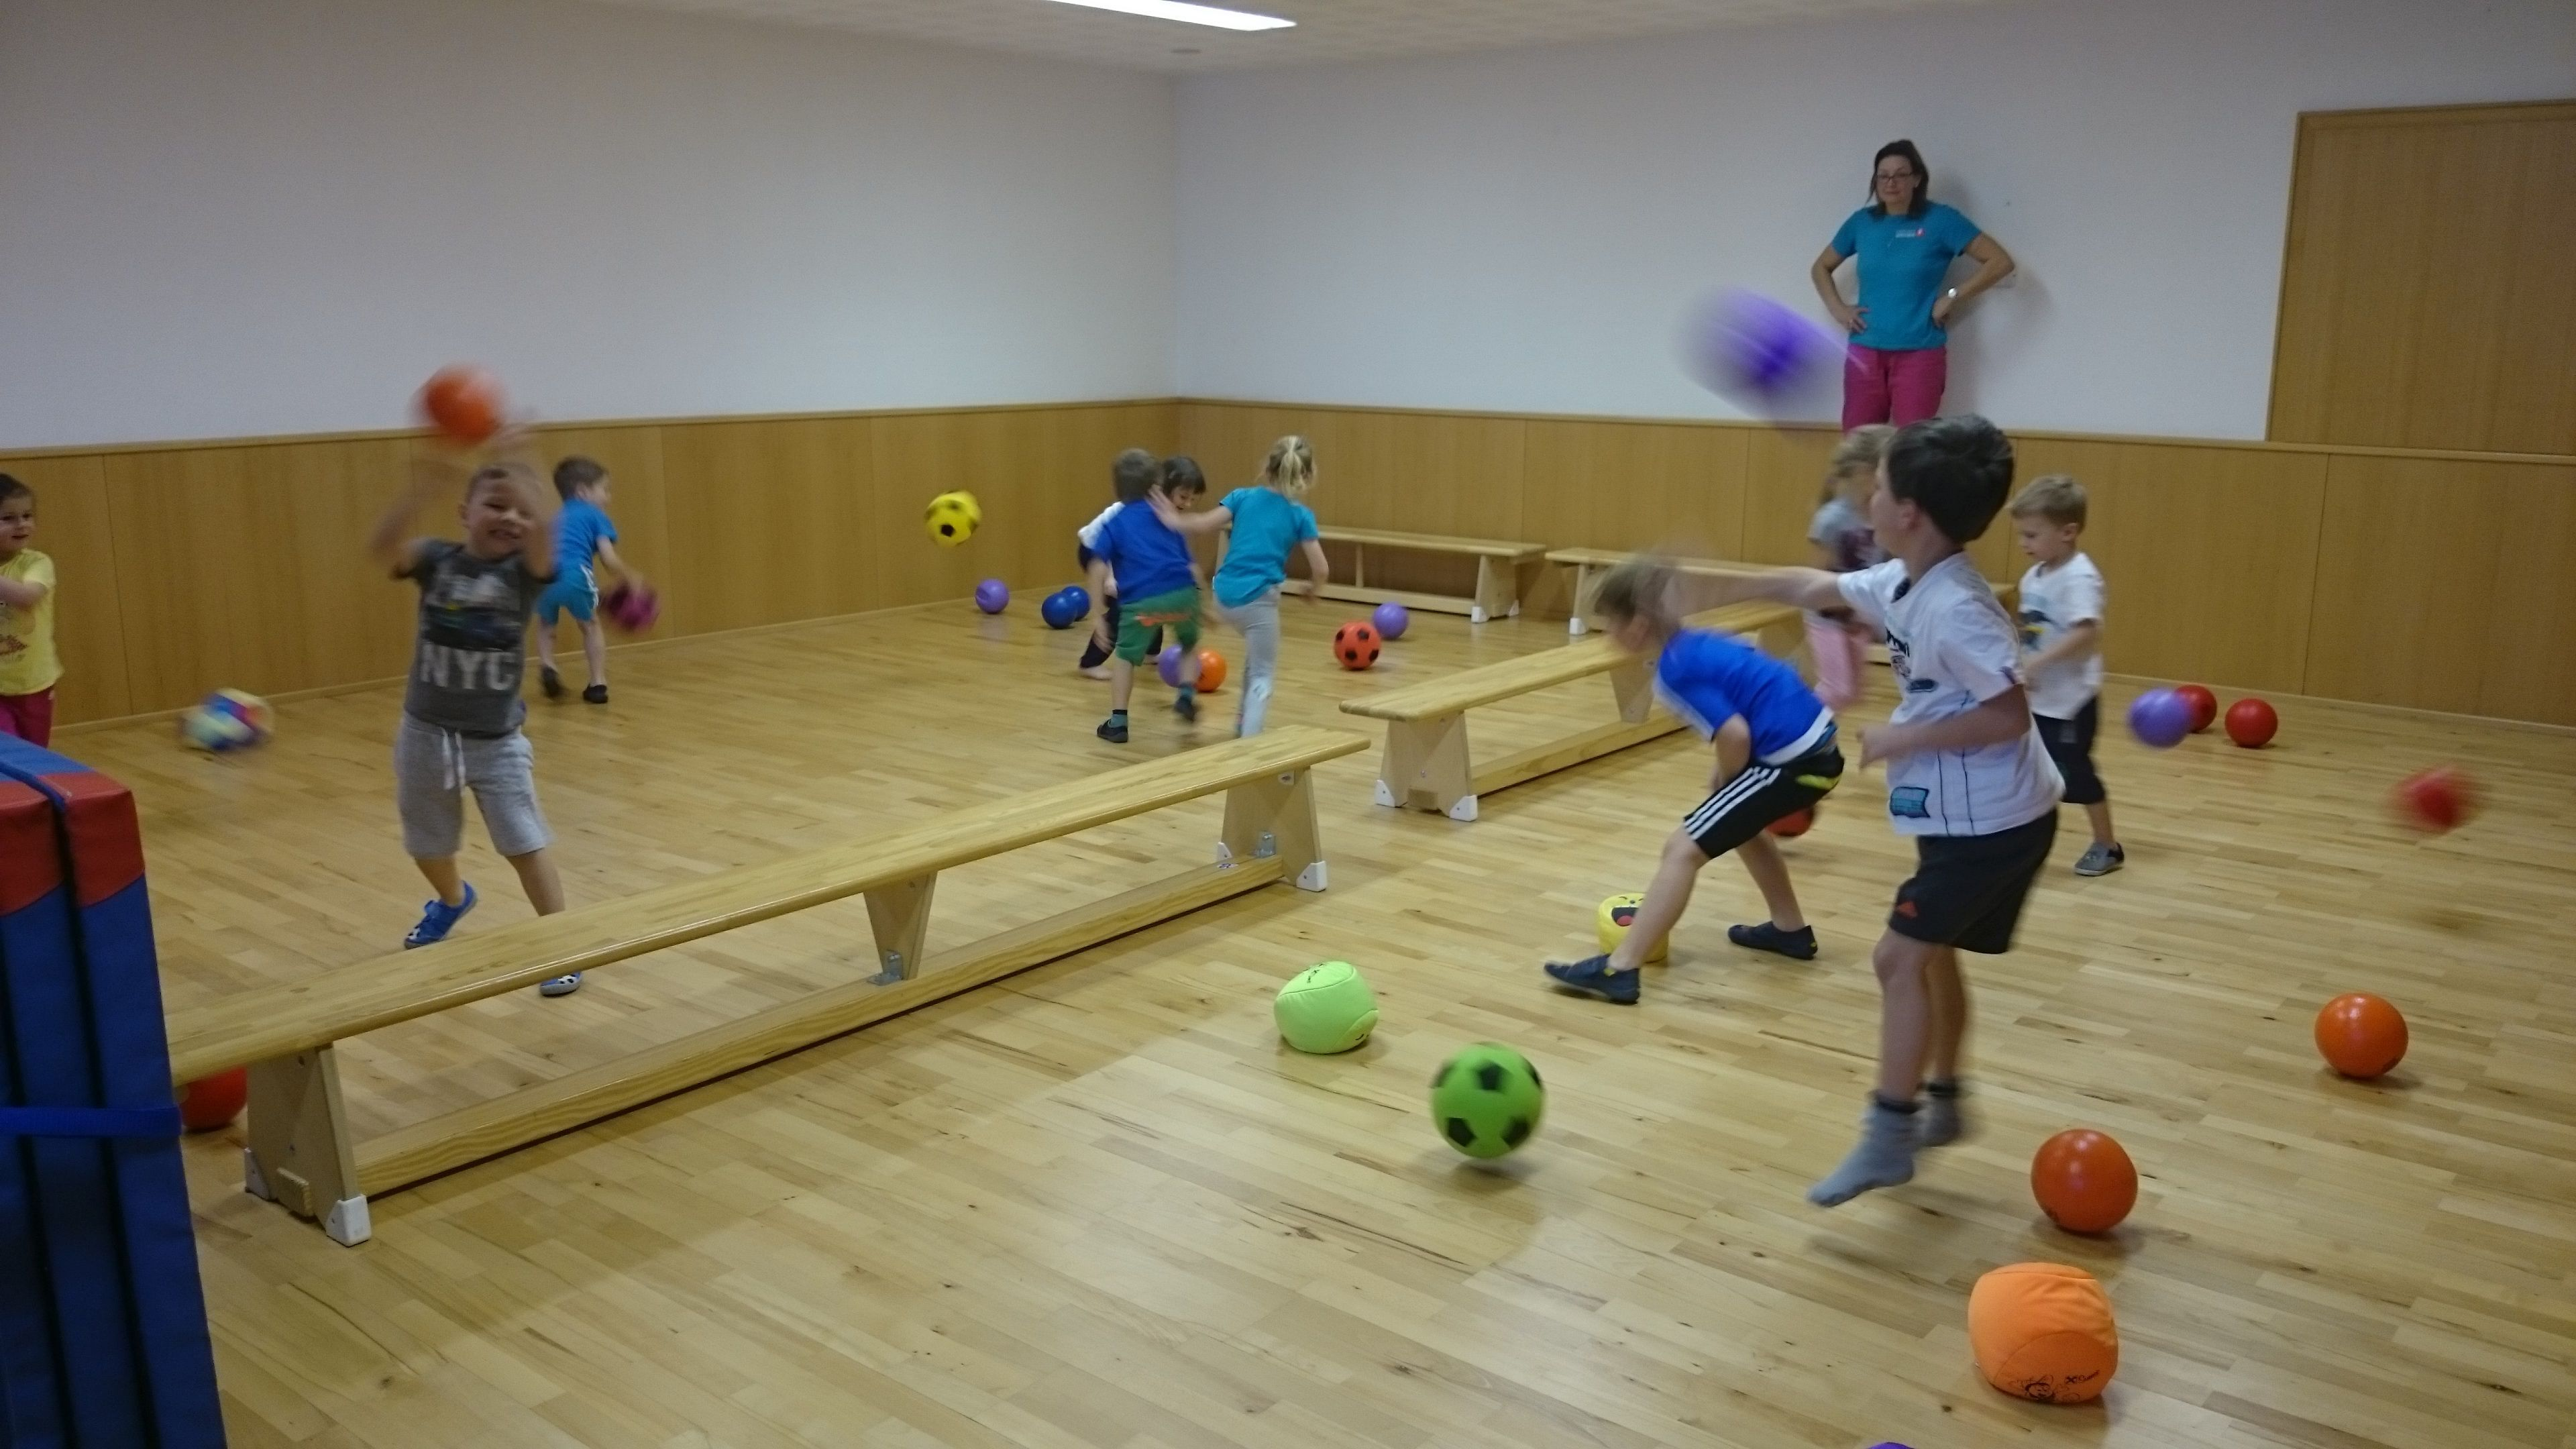 Kinderspiele Mit Ball